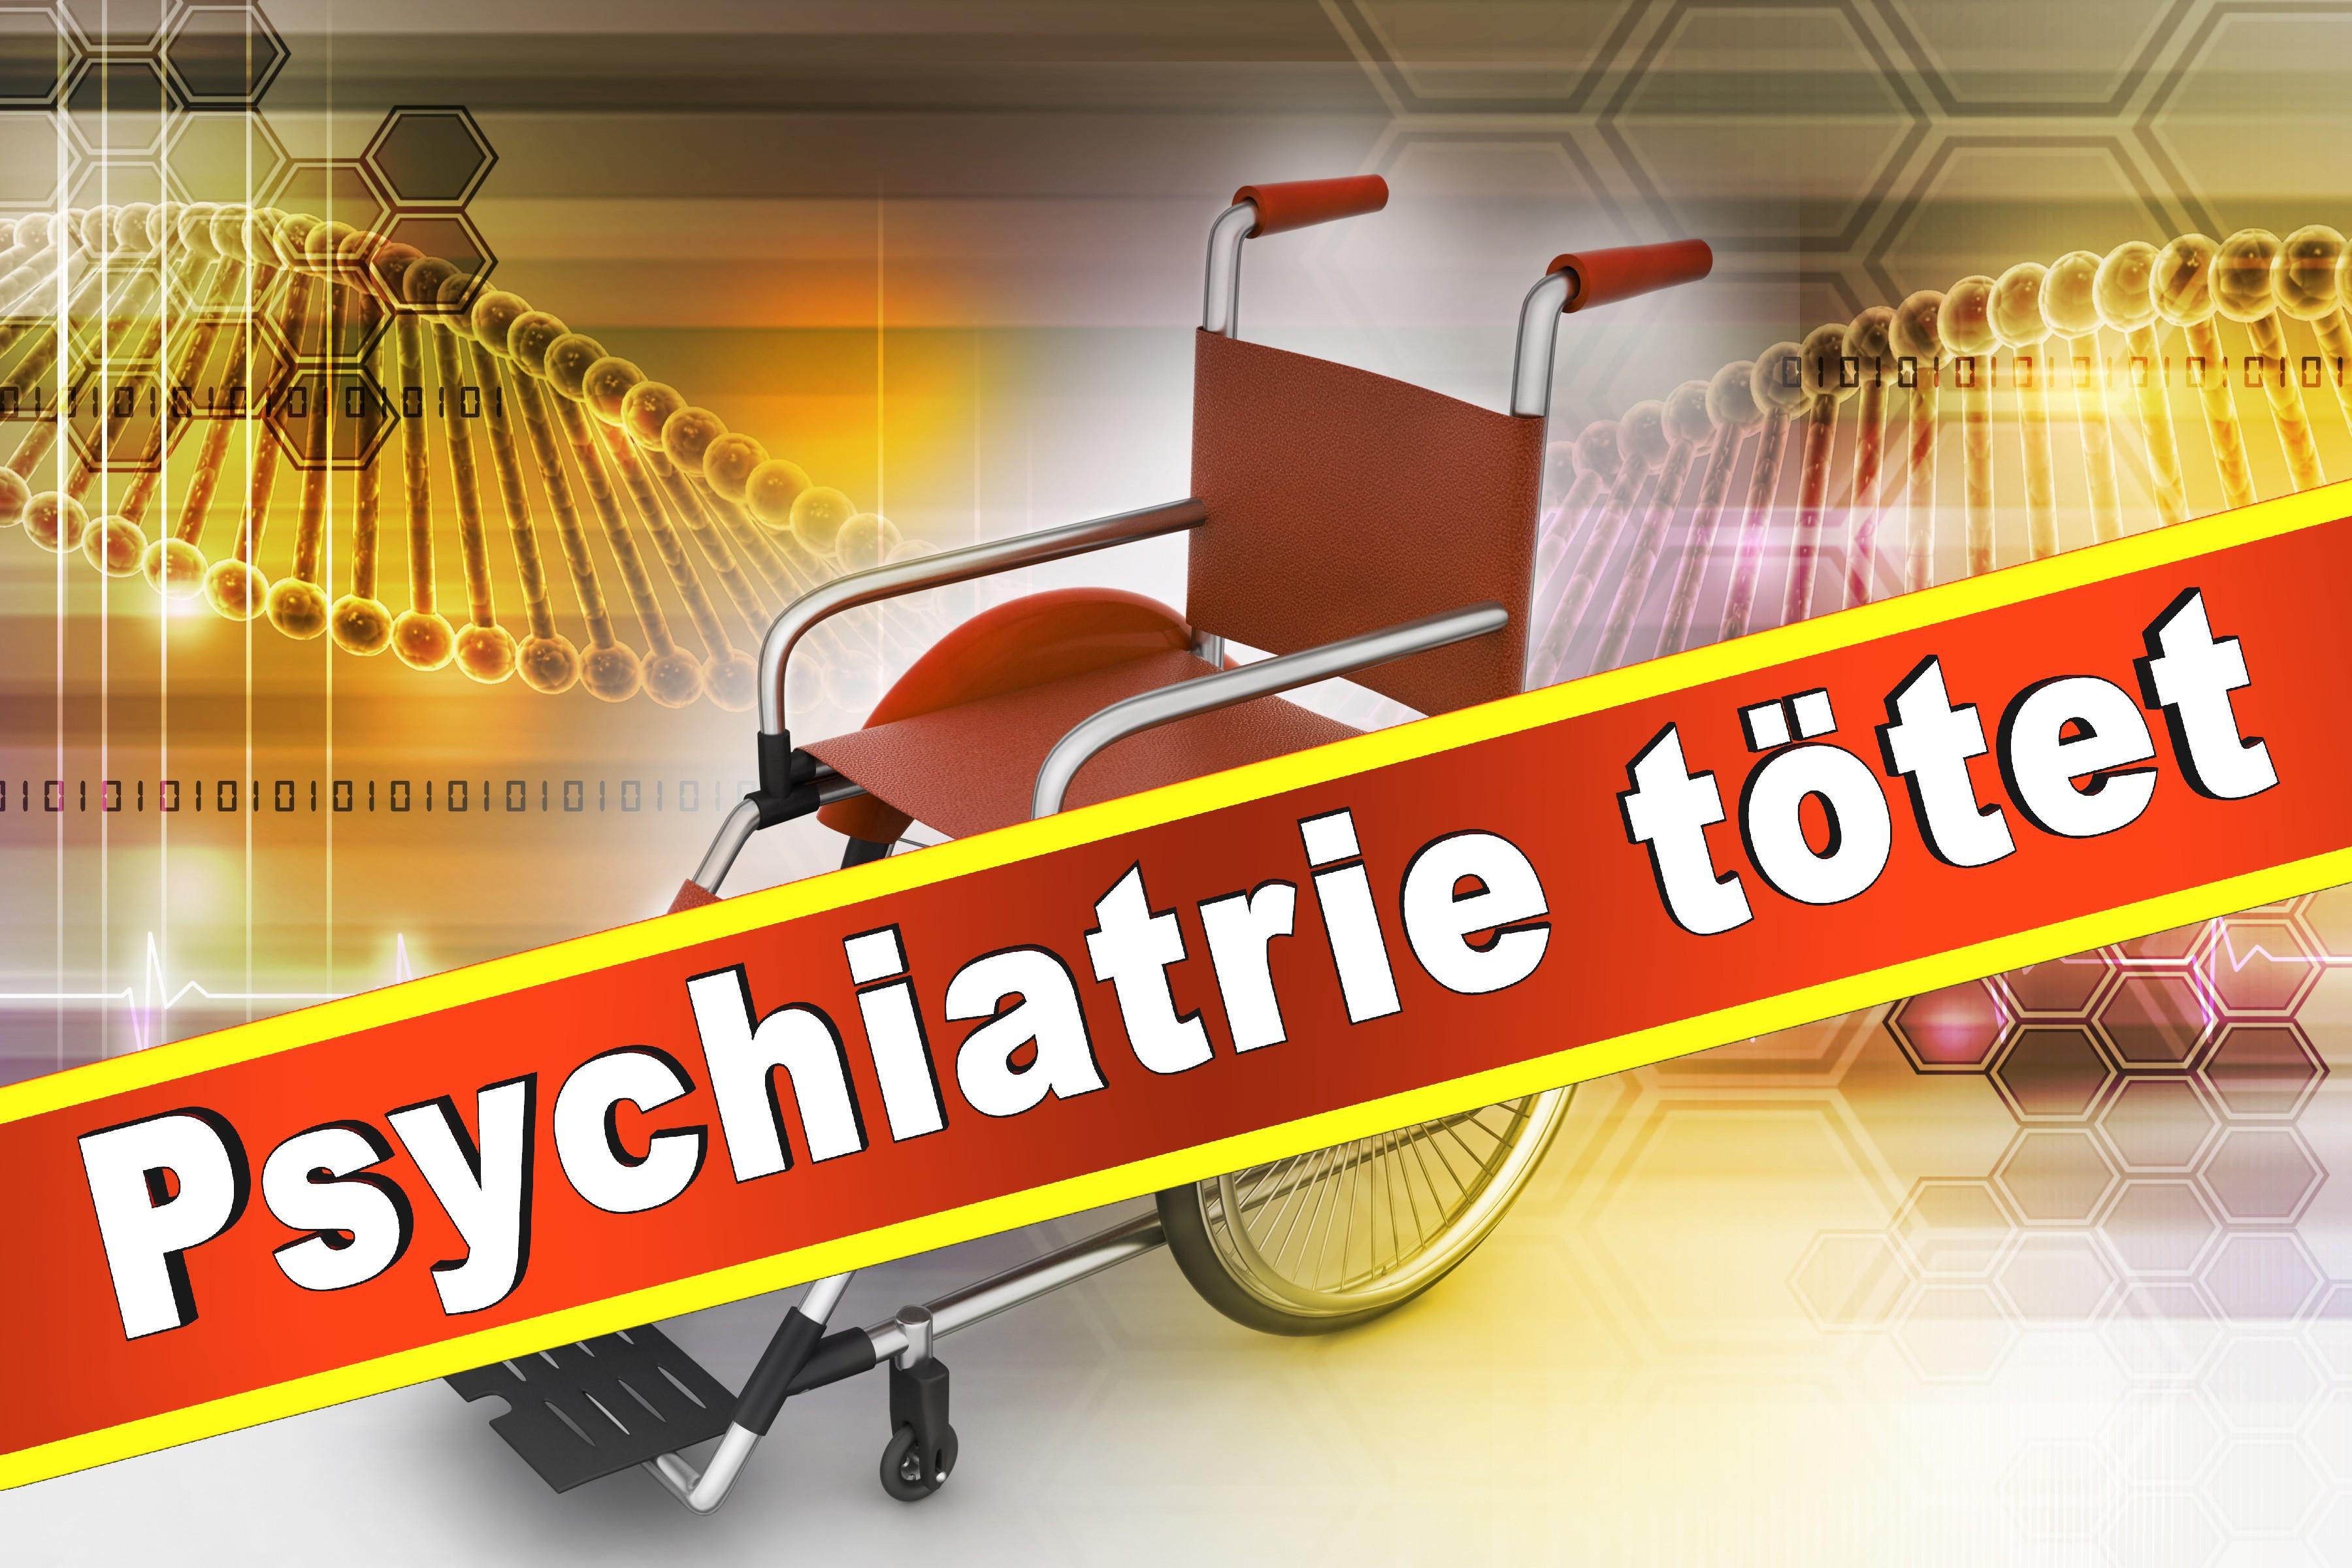 Medizinische Hochschule Hannover Klinik Für Psychiatrie Sozialpsychiatrie Und Psychotherapie Wielant Machleidt Psychiater Psychotherapeut Professor Irrenhaus Zwangspsychiatrie Mord Tod Folter